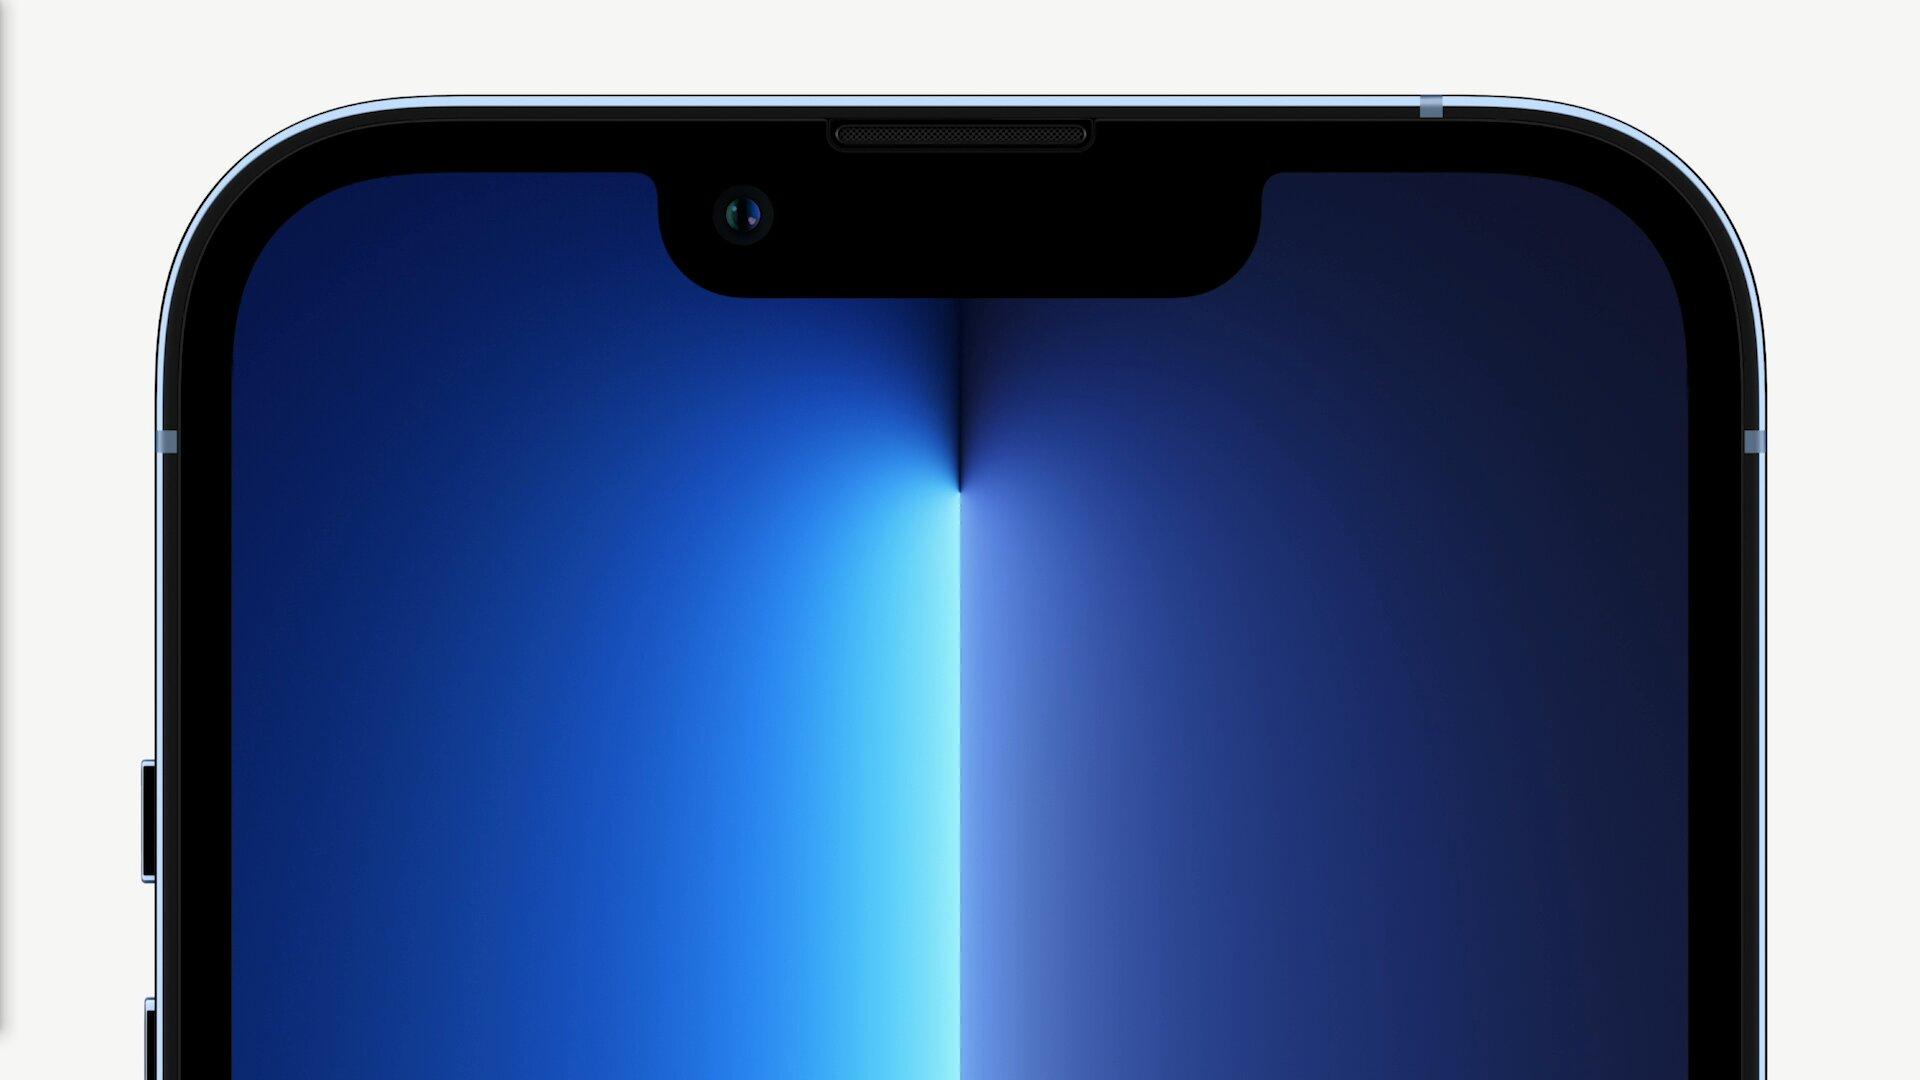 https://img.ibxk.com.br/2021/09/14/reproducao-apple-14154844347218.jpg?w=704